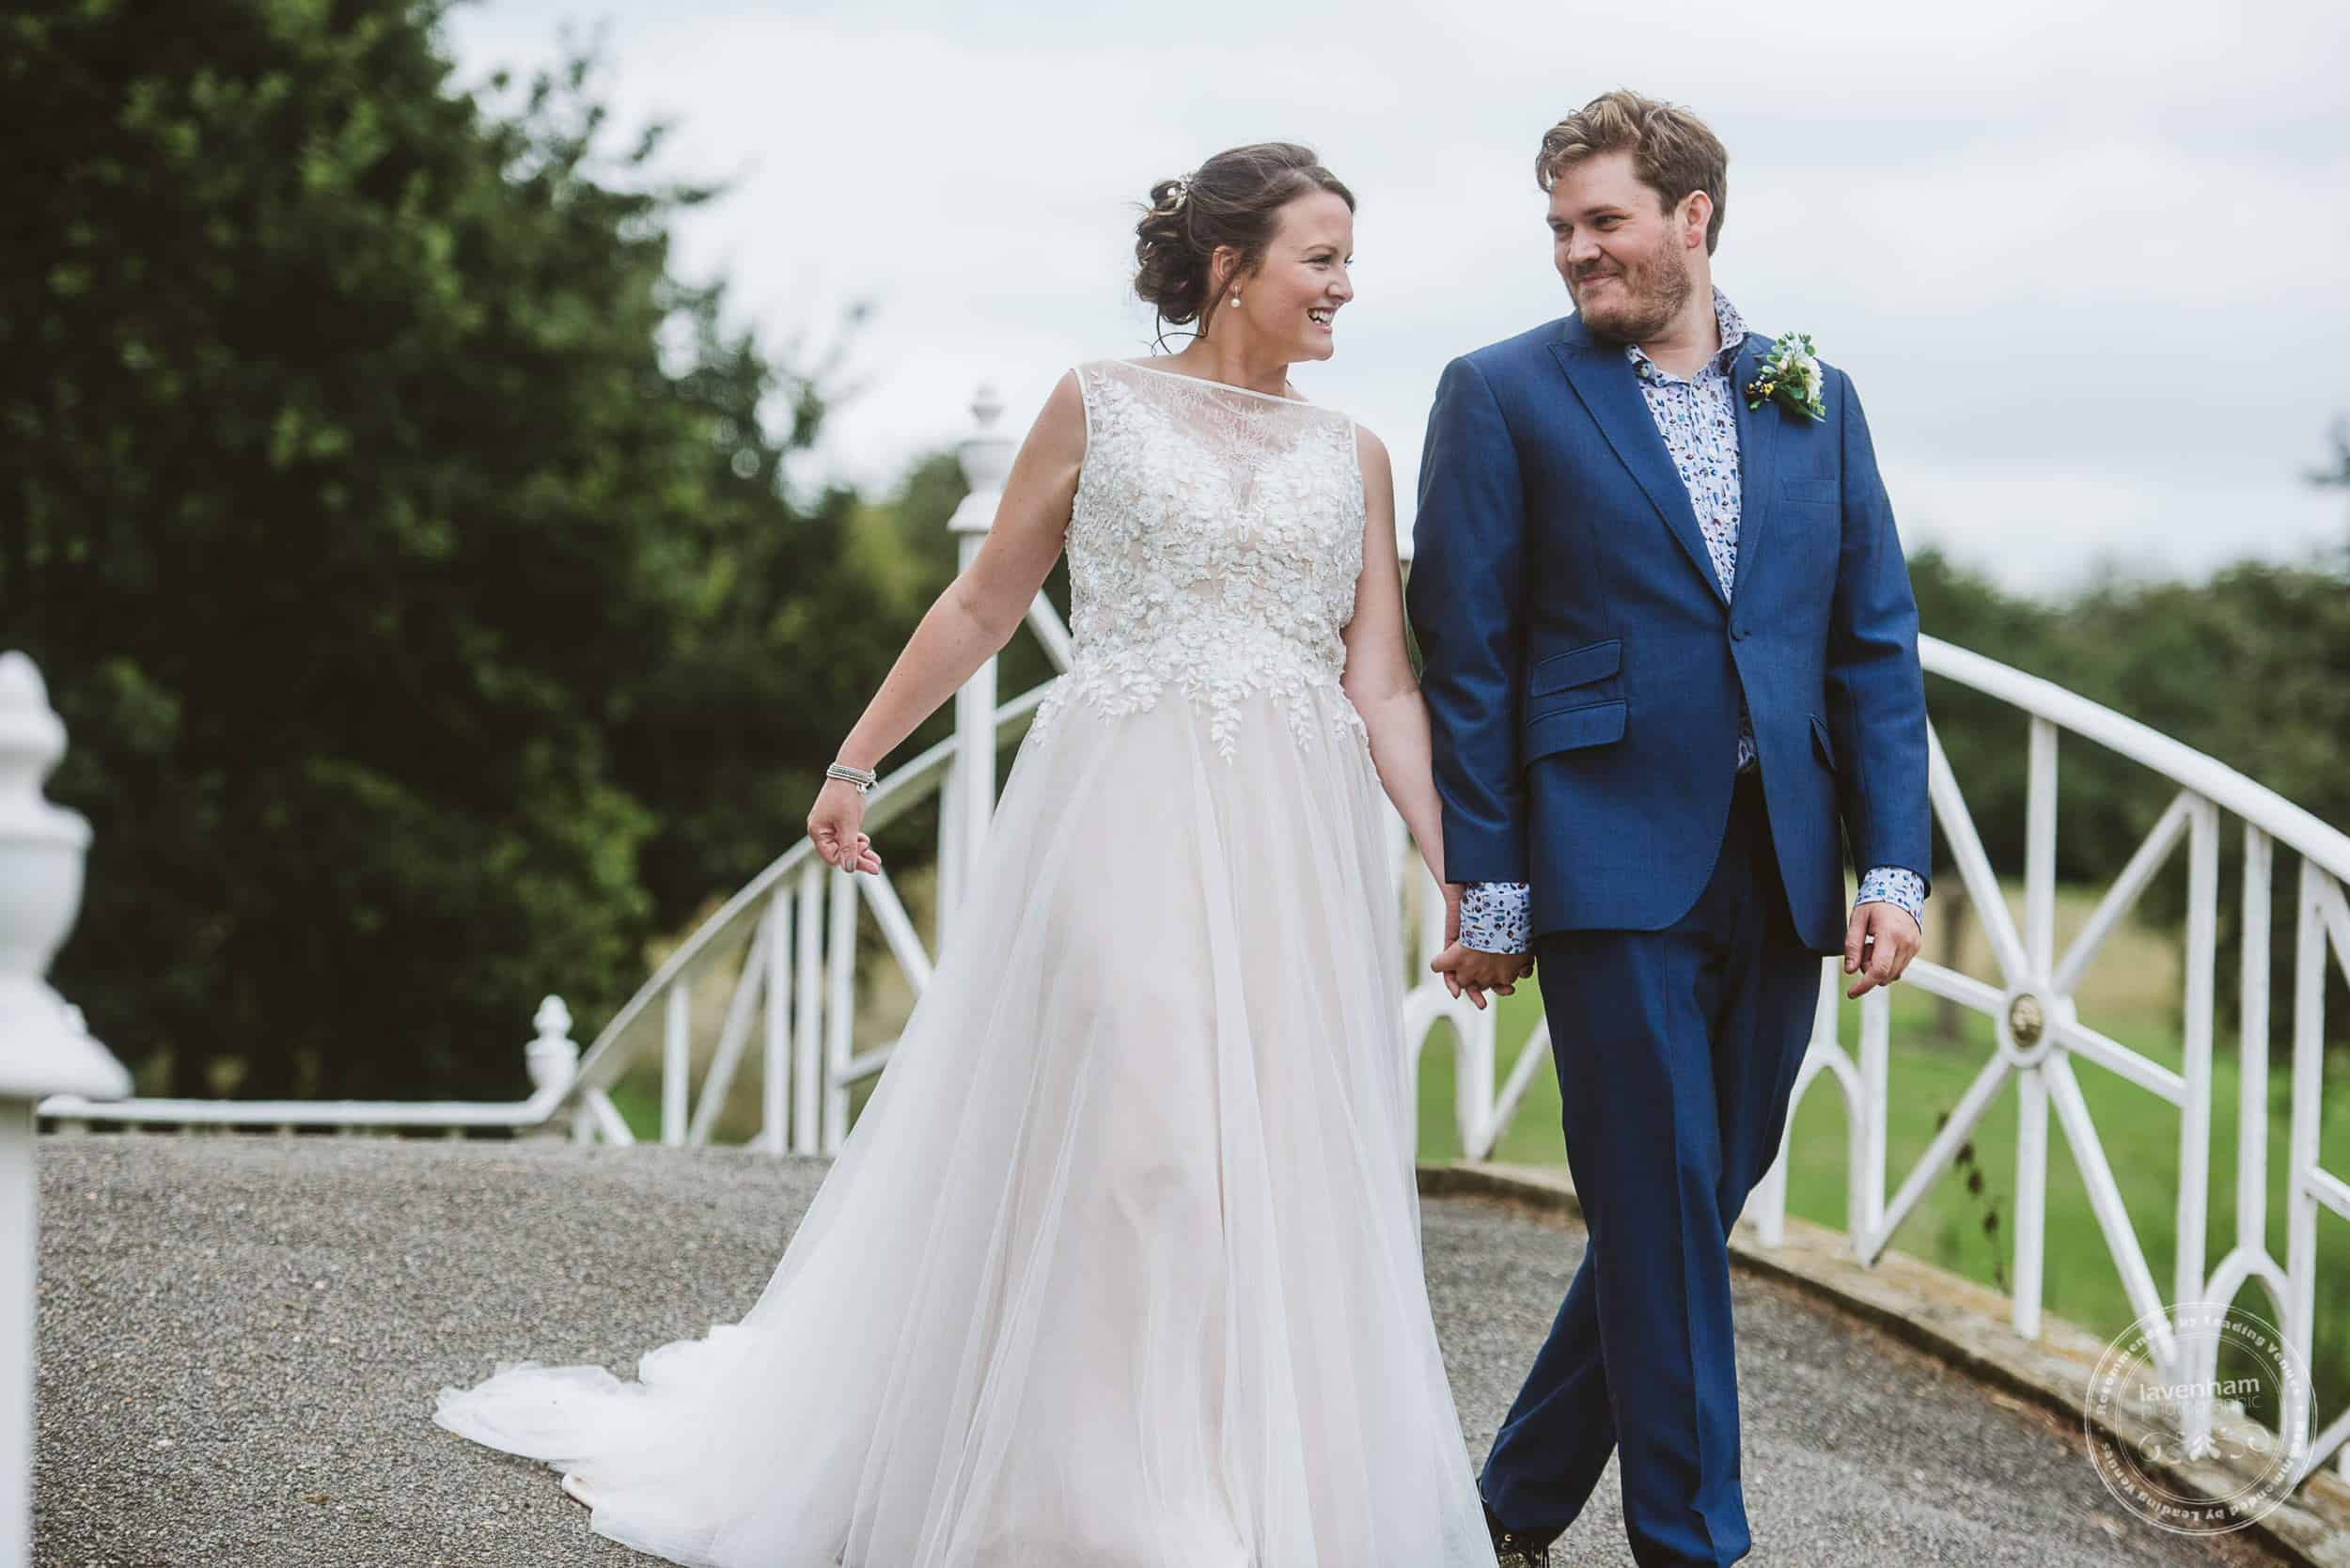 180818 Marks Hall Wedding Photography Lavenham Photographic 097